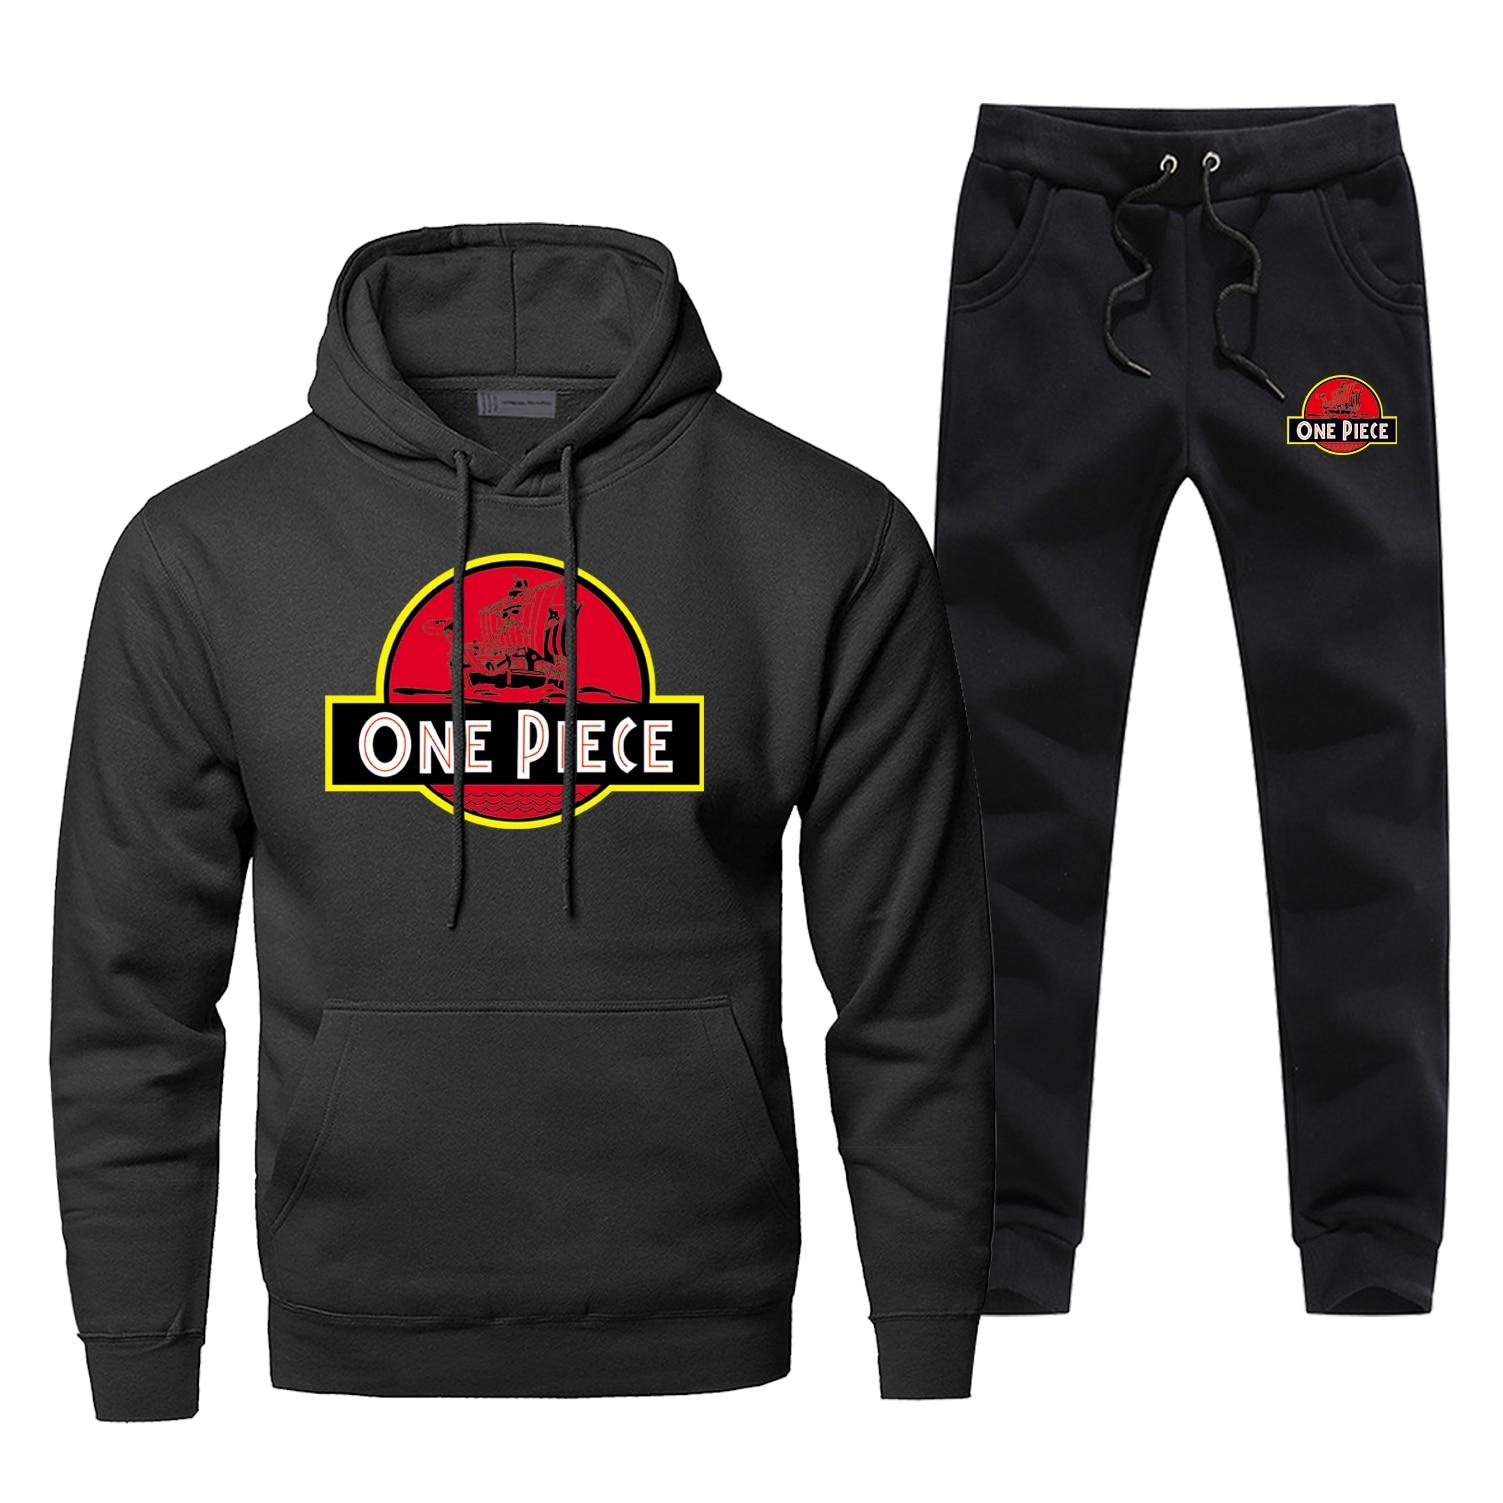 Funny Japanese Anime One Piece Hoodies Pants Sets Men Fashion Print Monkey D. Luffy Hip Hop Streetwear Sweatshirts Sportswear